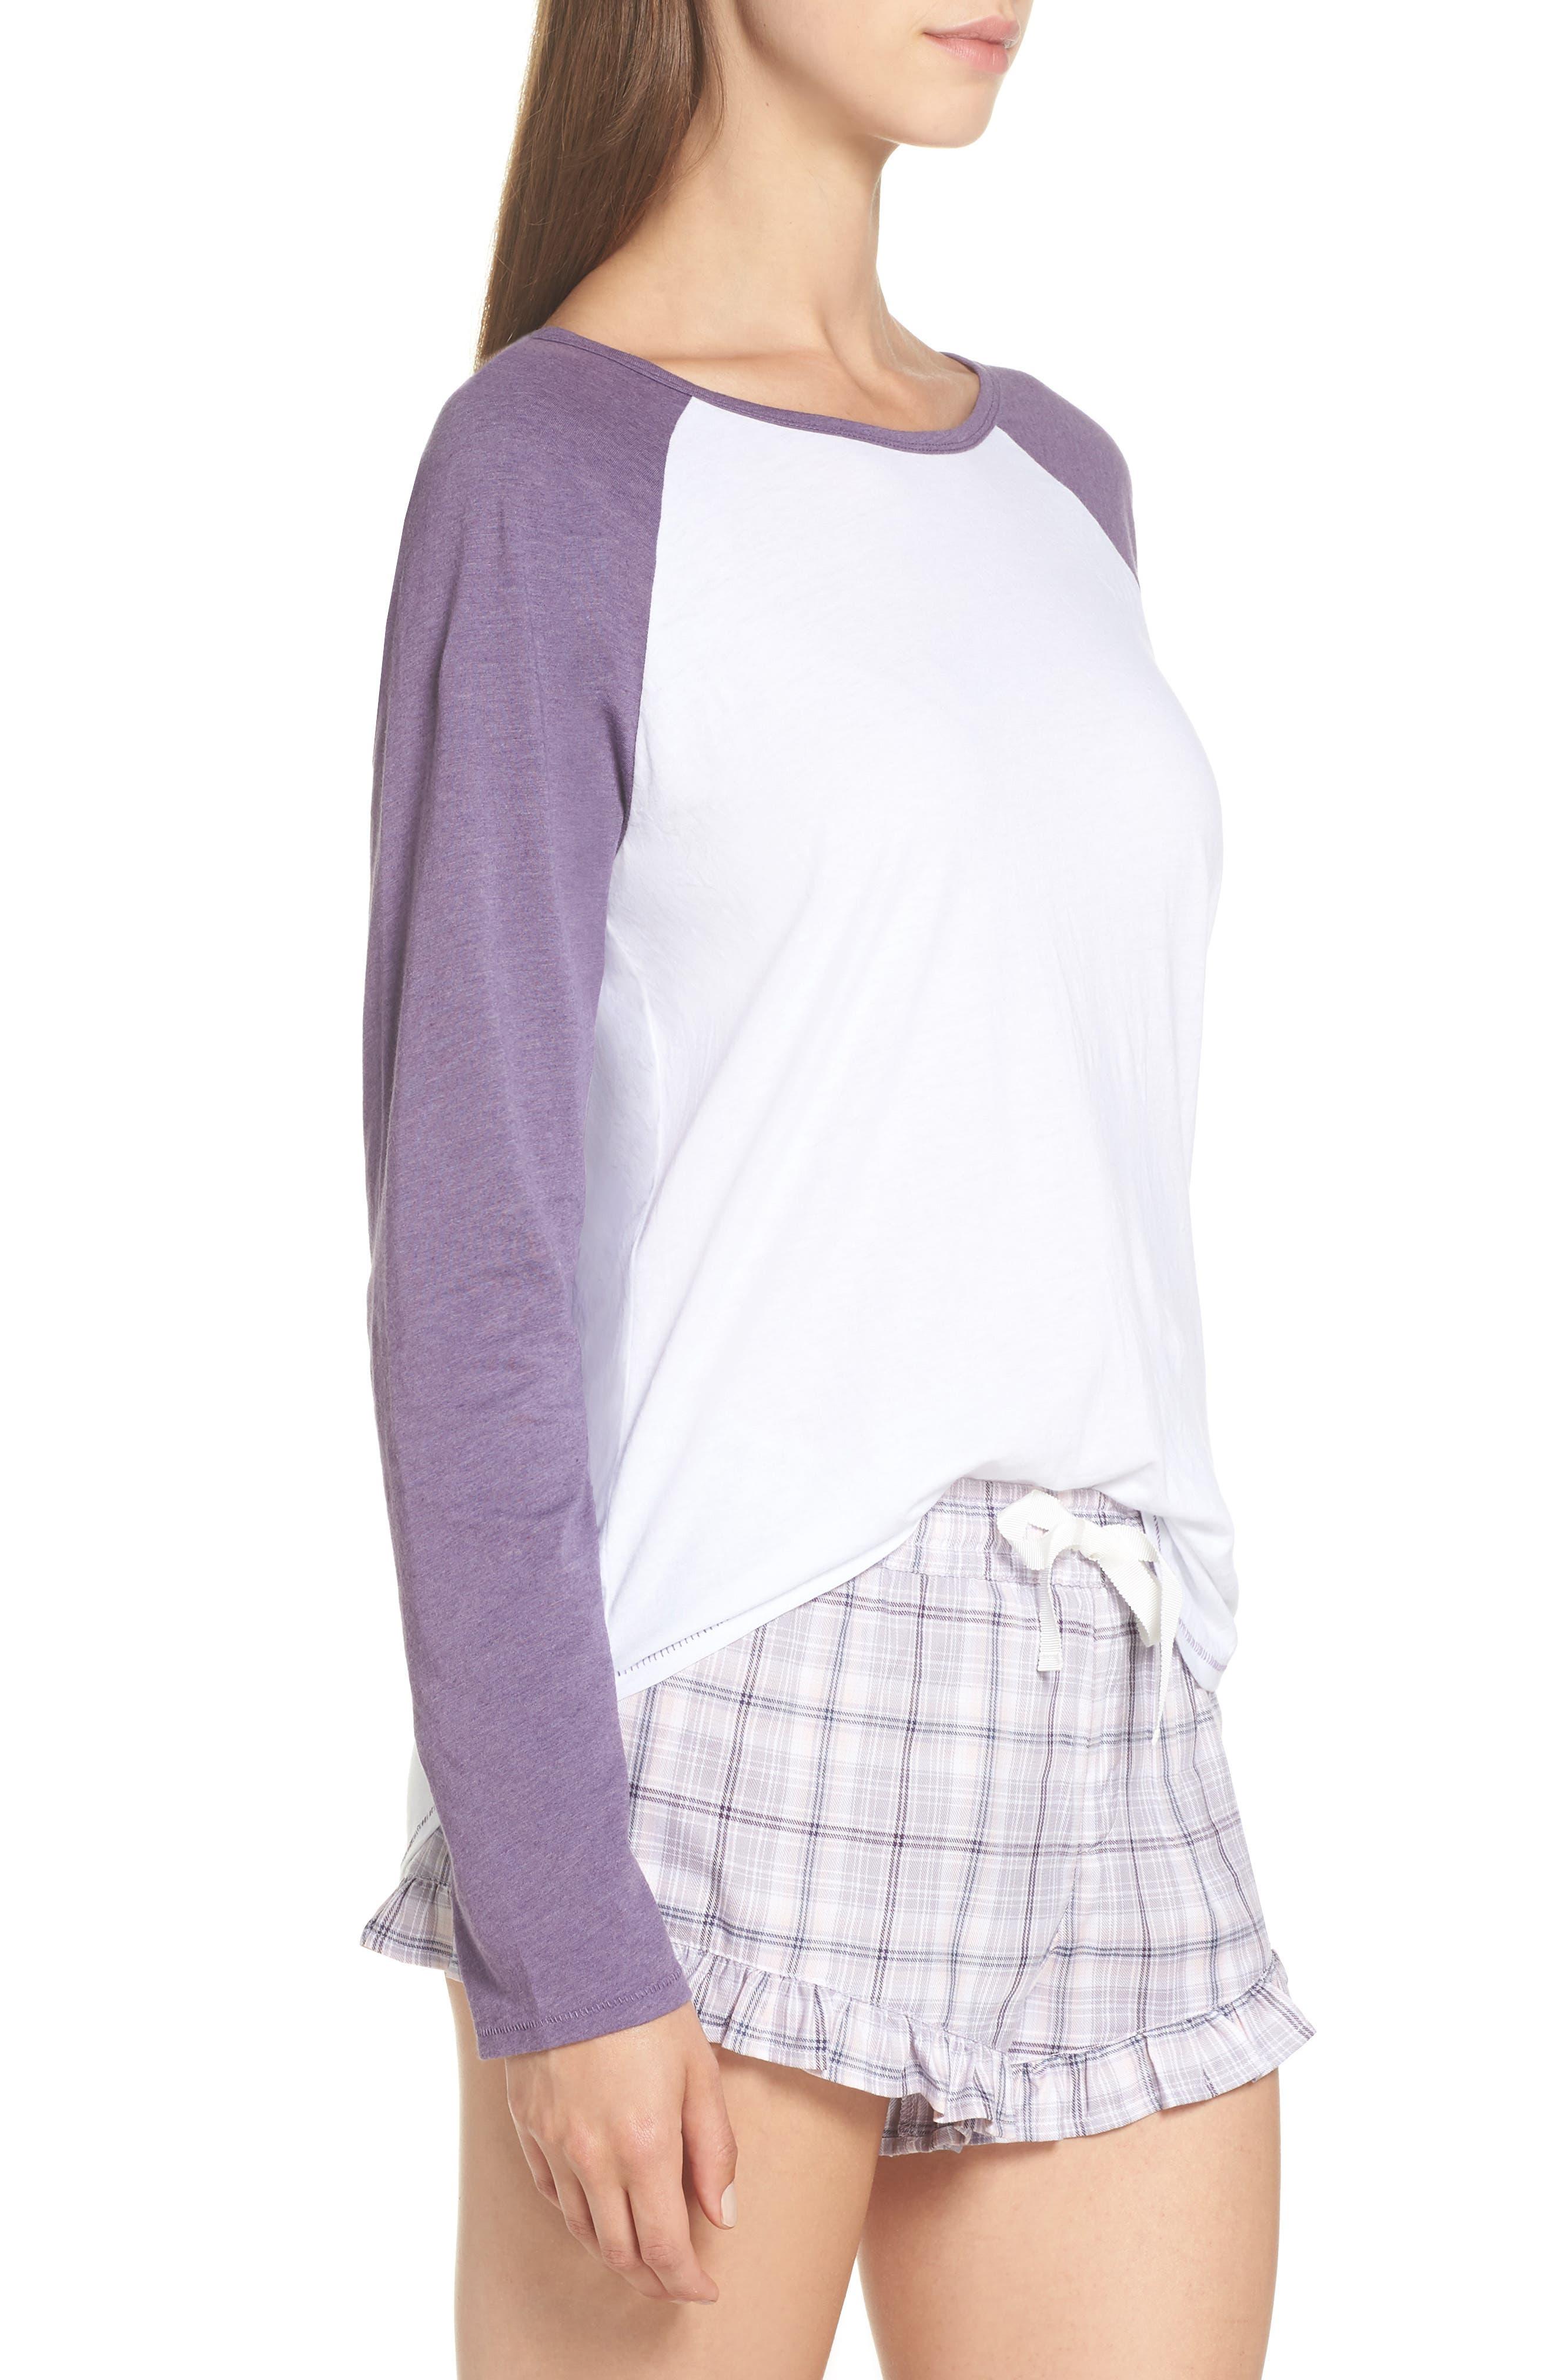 Charly Short Pajamas,                             Alternate thumbnail 3, color,                             LAVENDER AURA PLAID